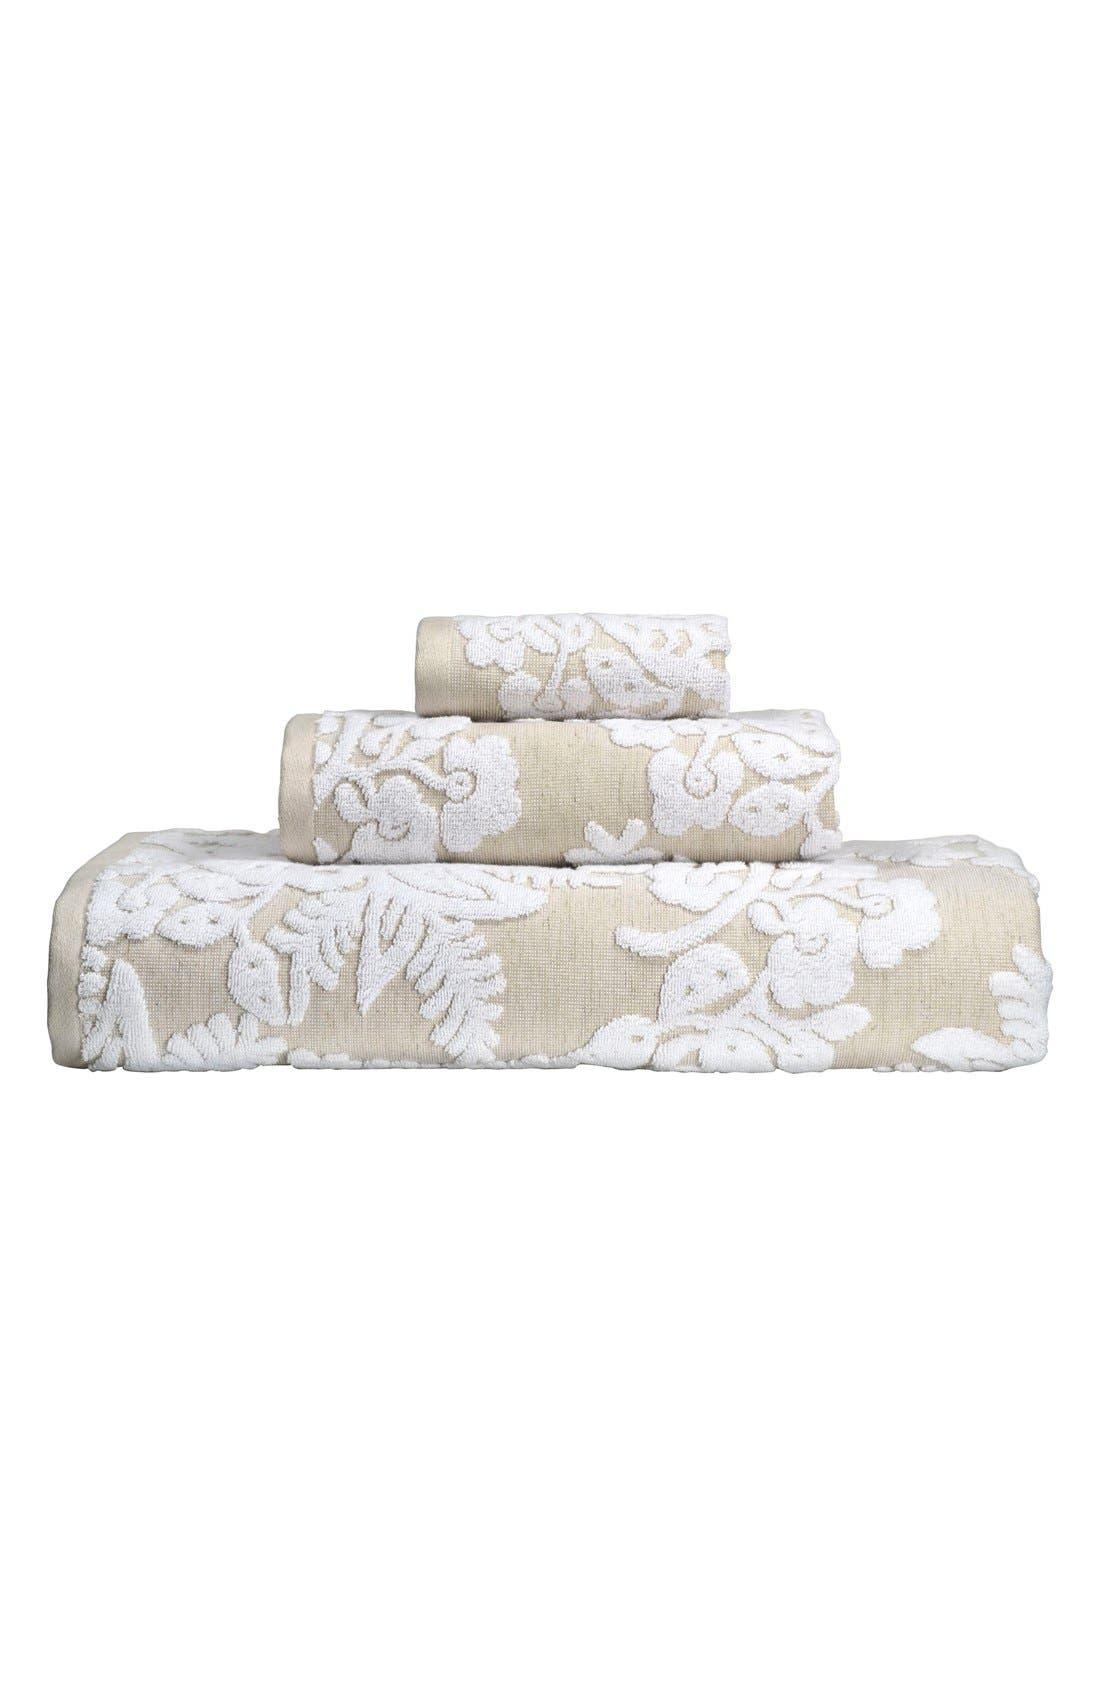 Alternate Image 2  - John Robshaw 'Pasak' Bath Towel